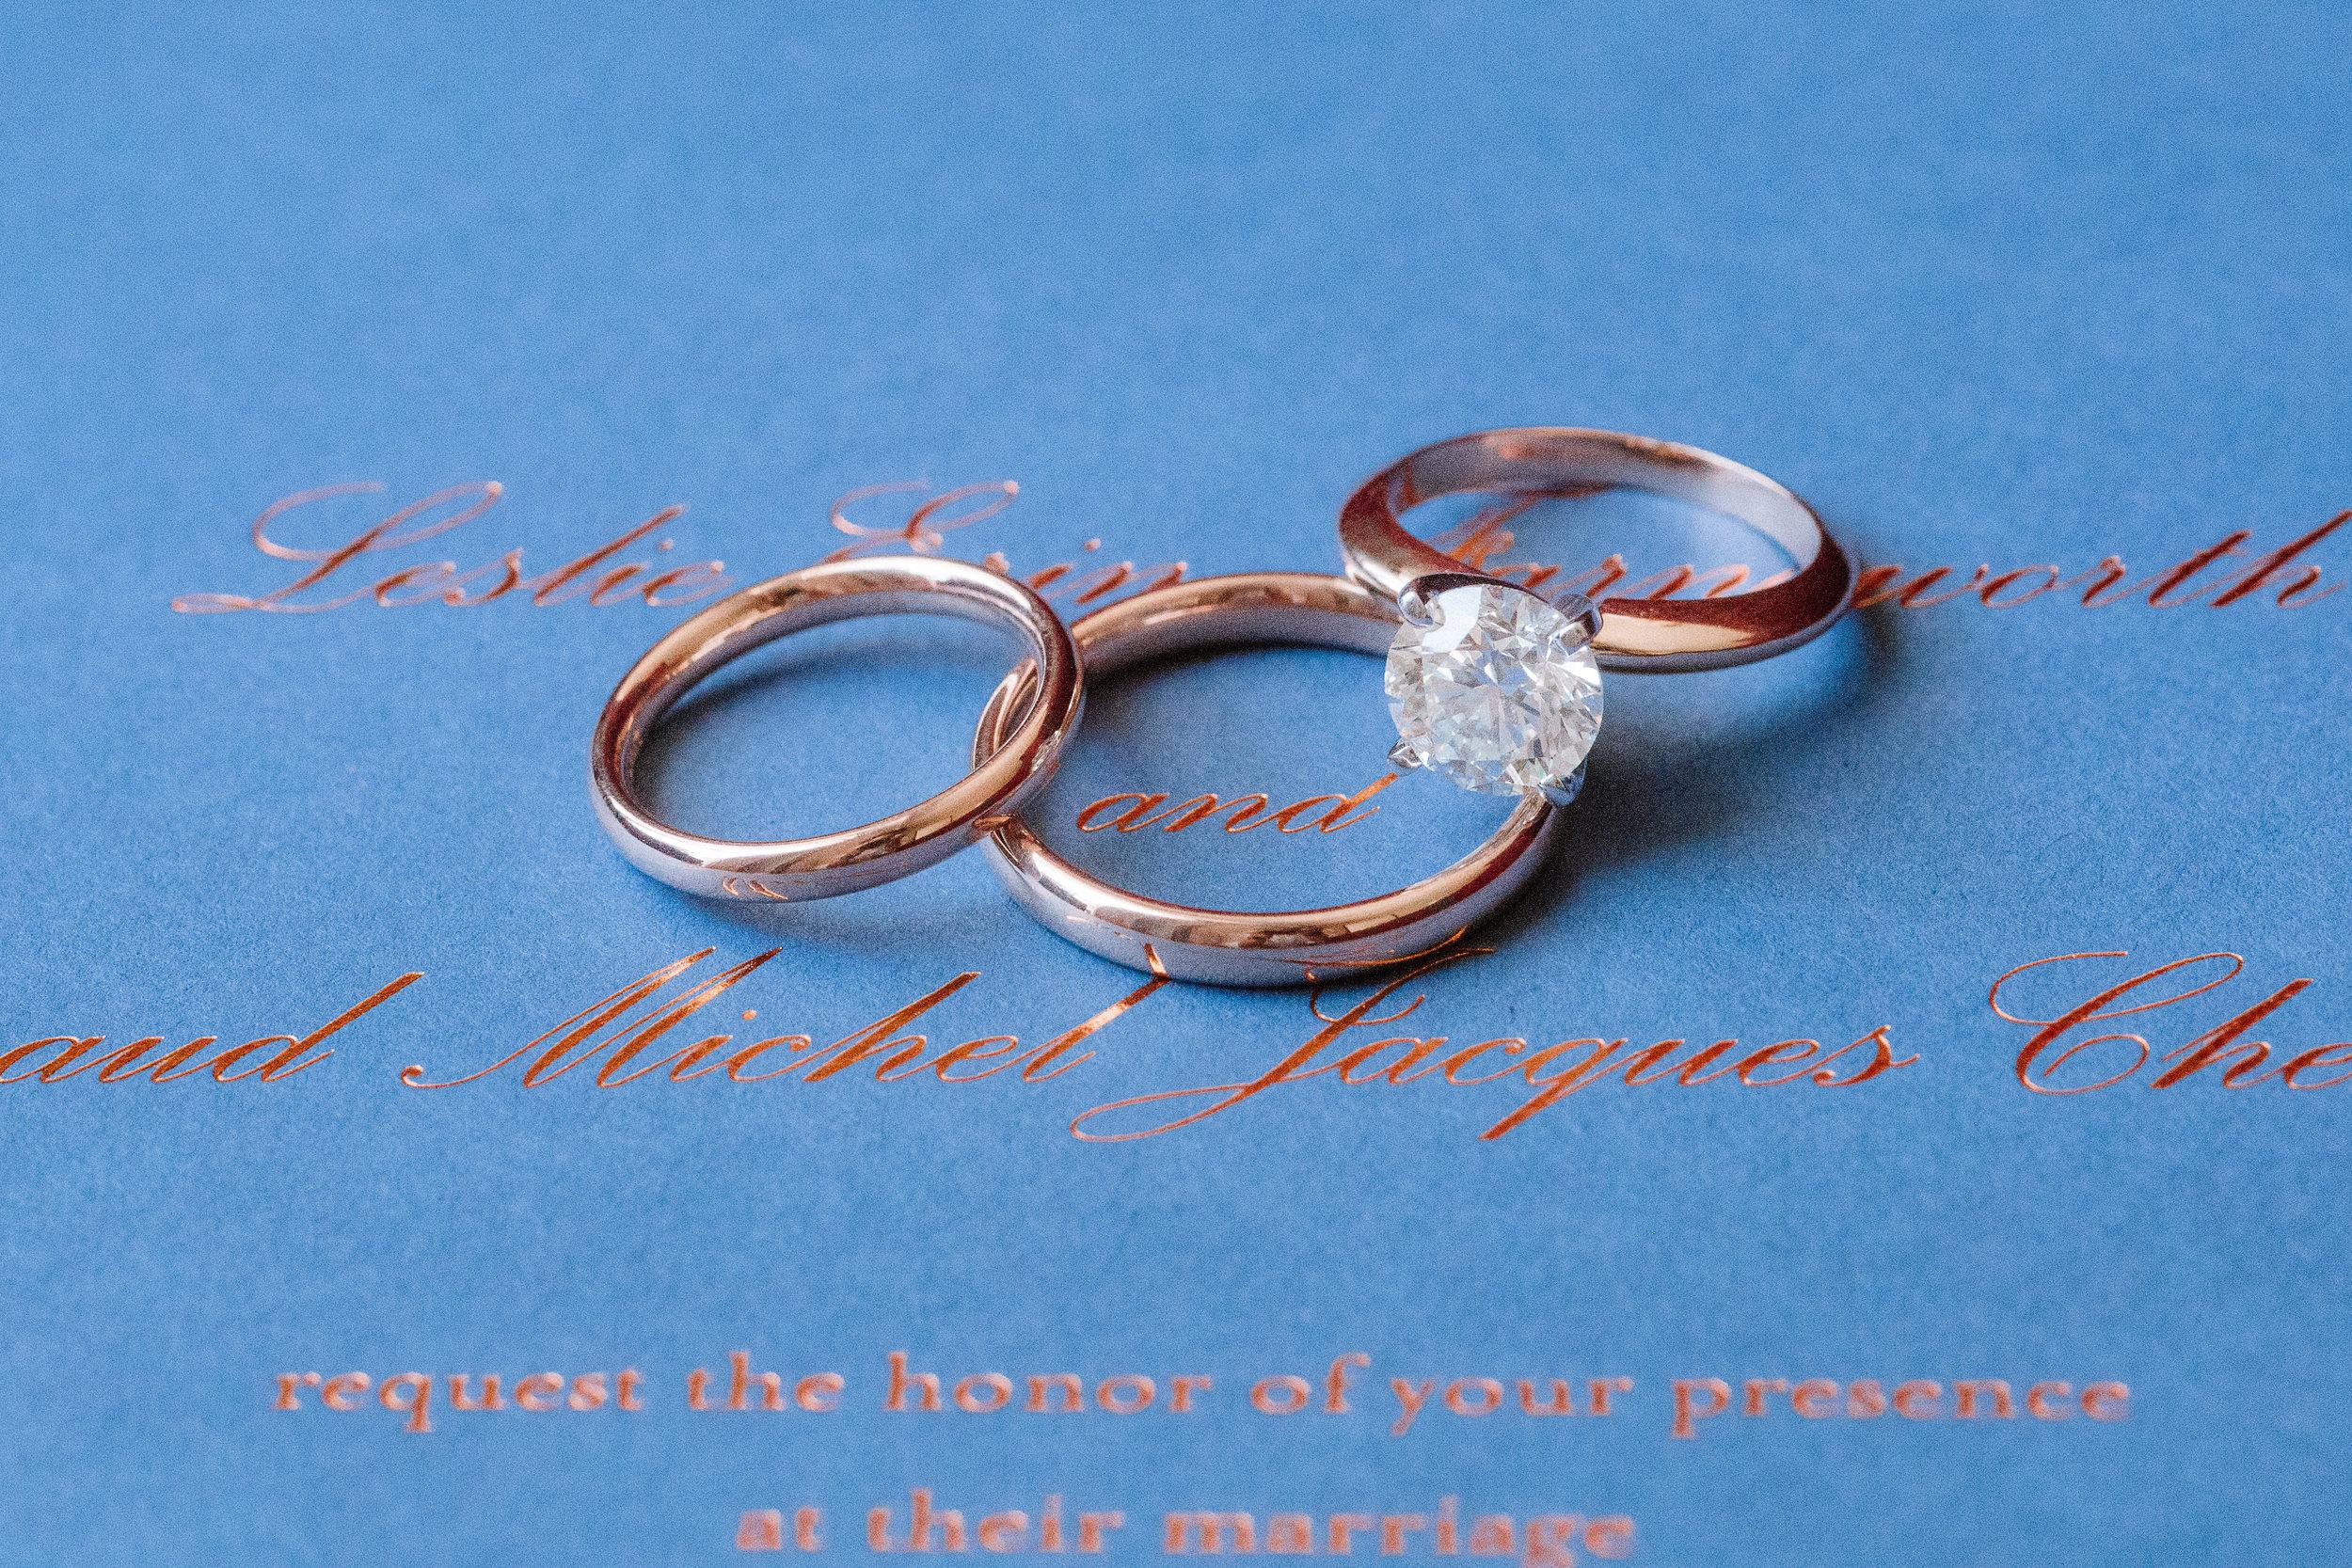 Leslie and Arnaud's wedding rings and invitation. Image credit:  Ian Holmes.